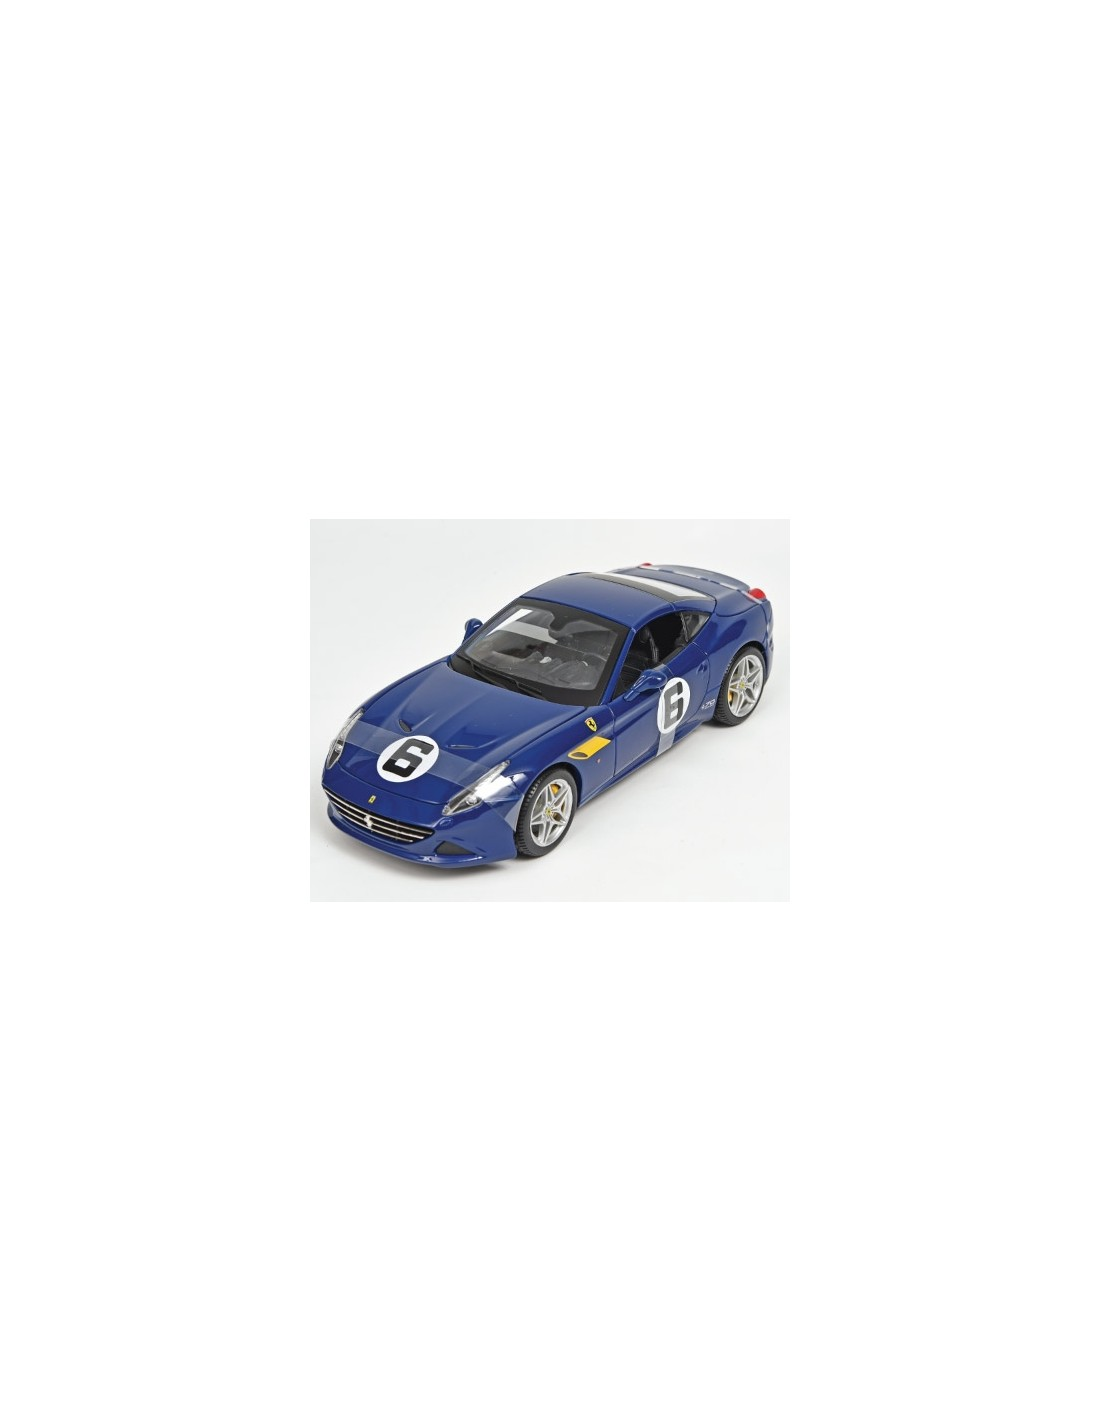 BBURAGO 76104 1/18 Ferrari California T The Sunoco 2016